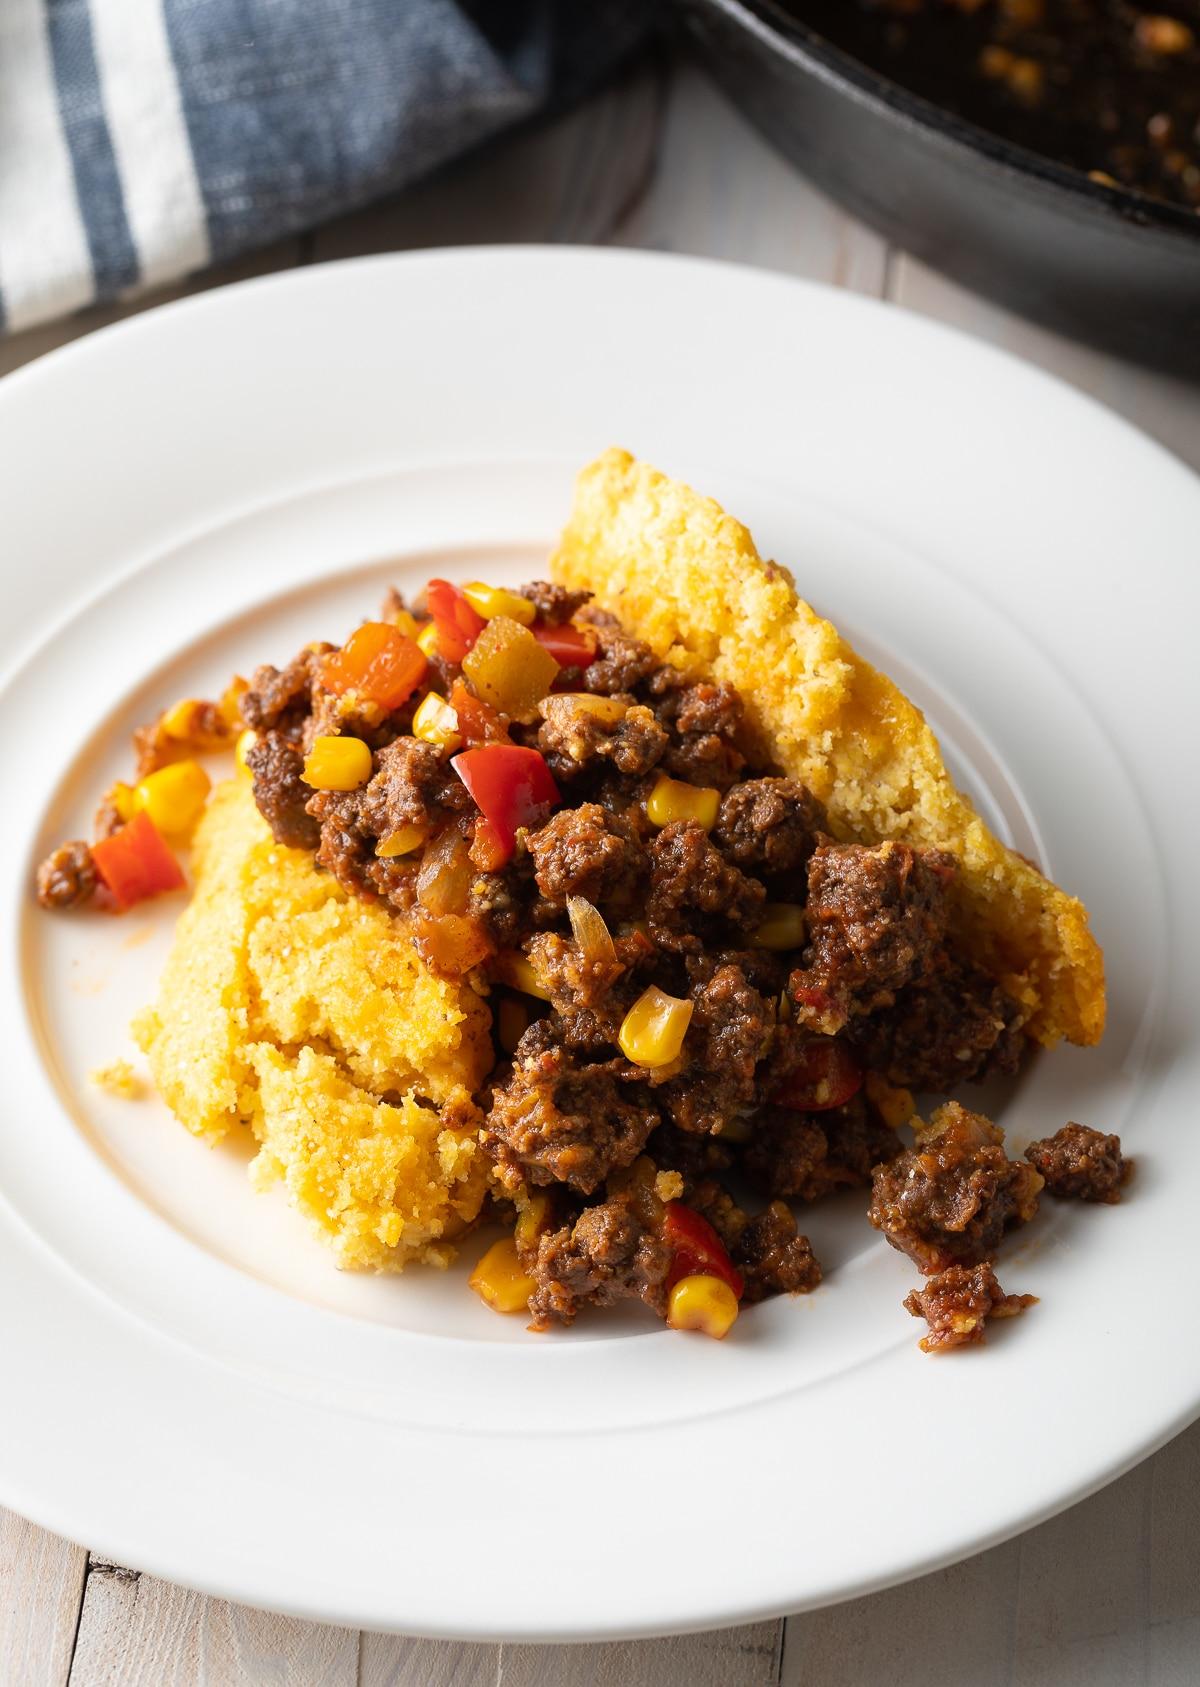 One-Pot Tamale Pie Recipe - Easy to Make and Gluten Free! #tamales #tamalepie #glutenfreedinner #glutenfreerecipe #aspicyperspective